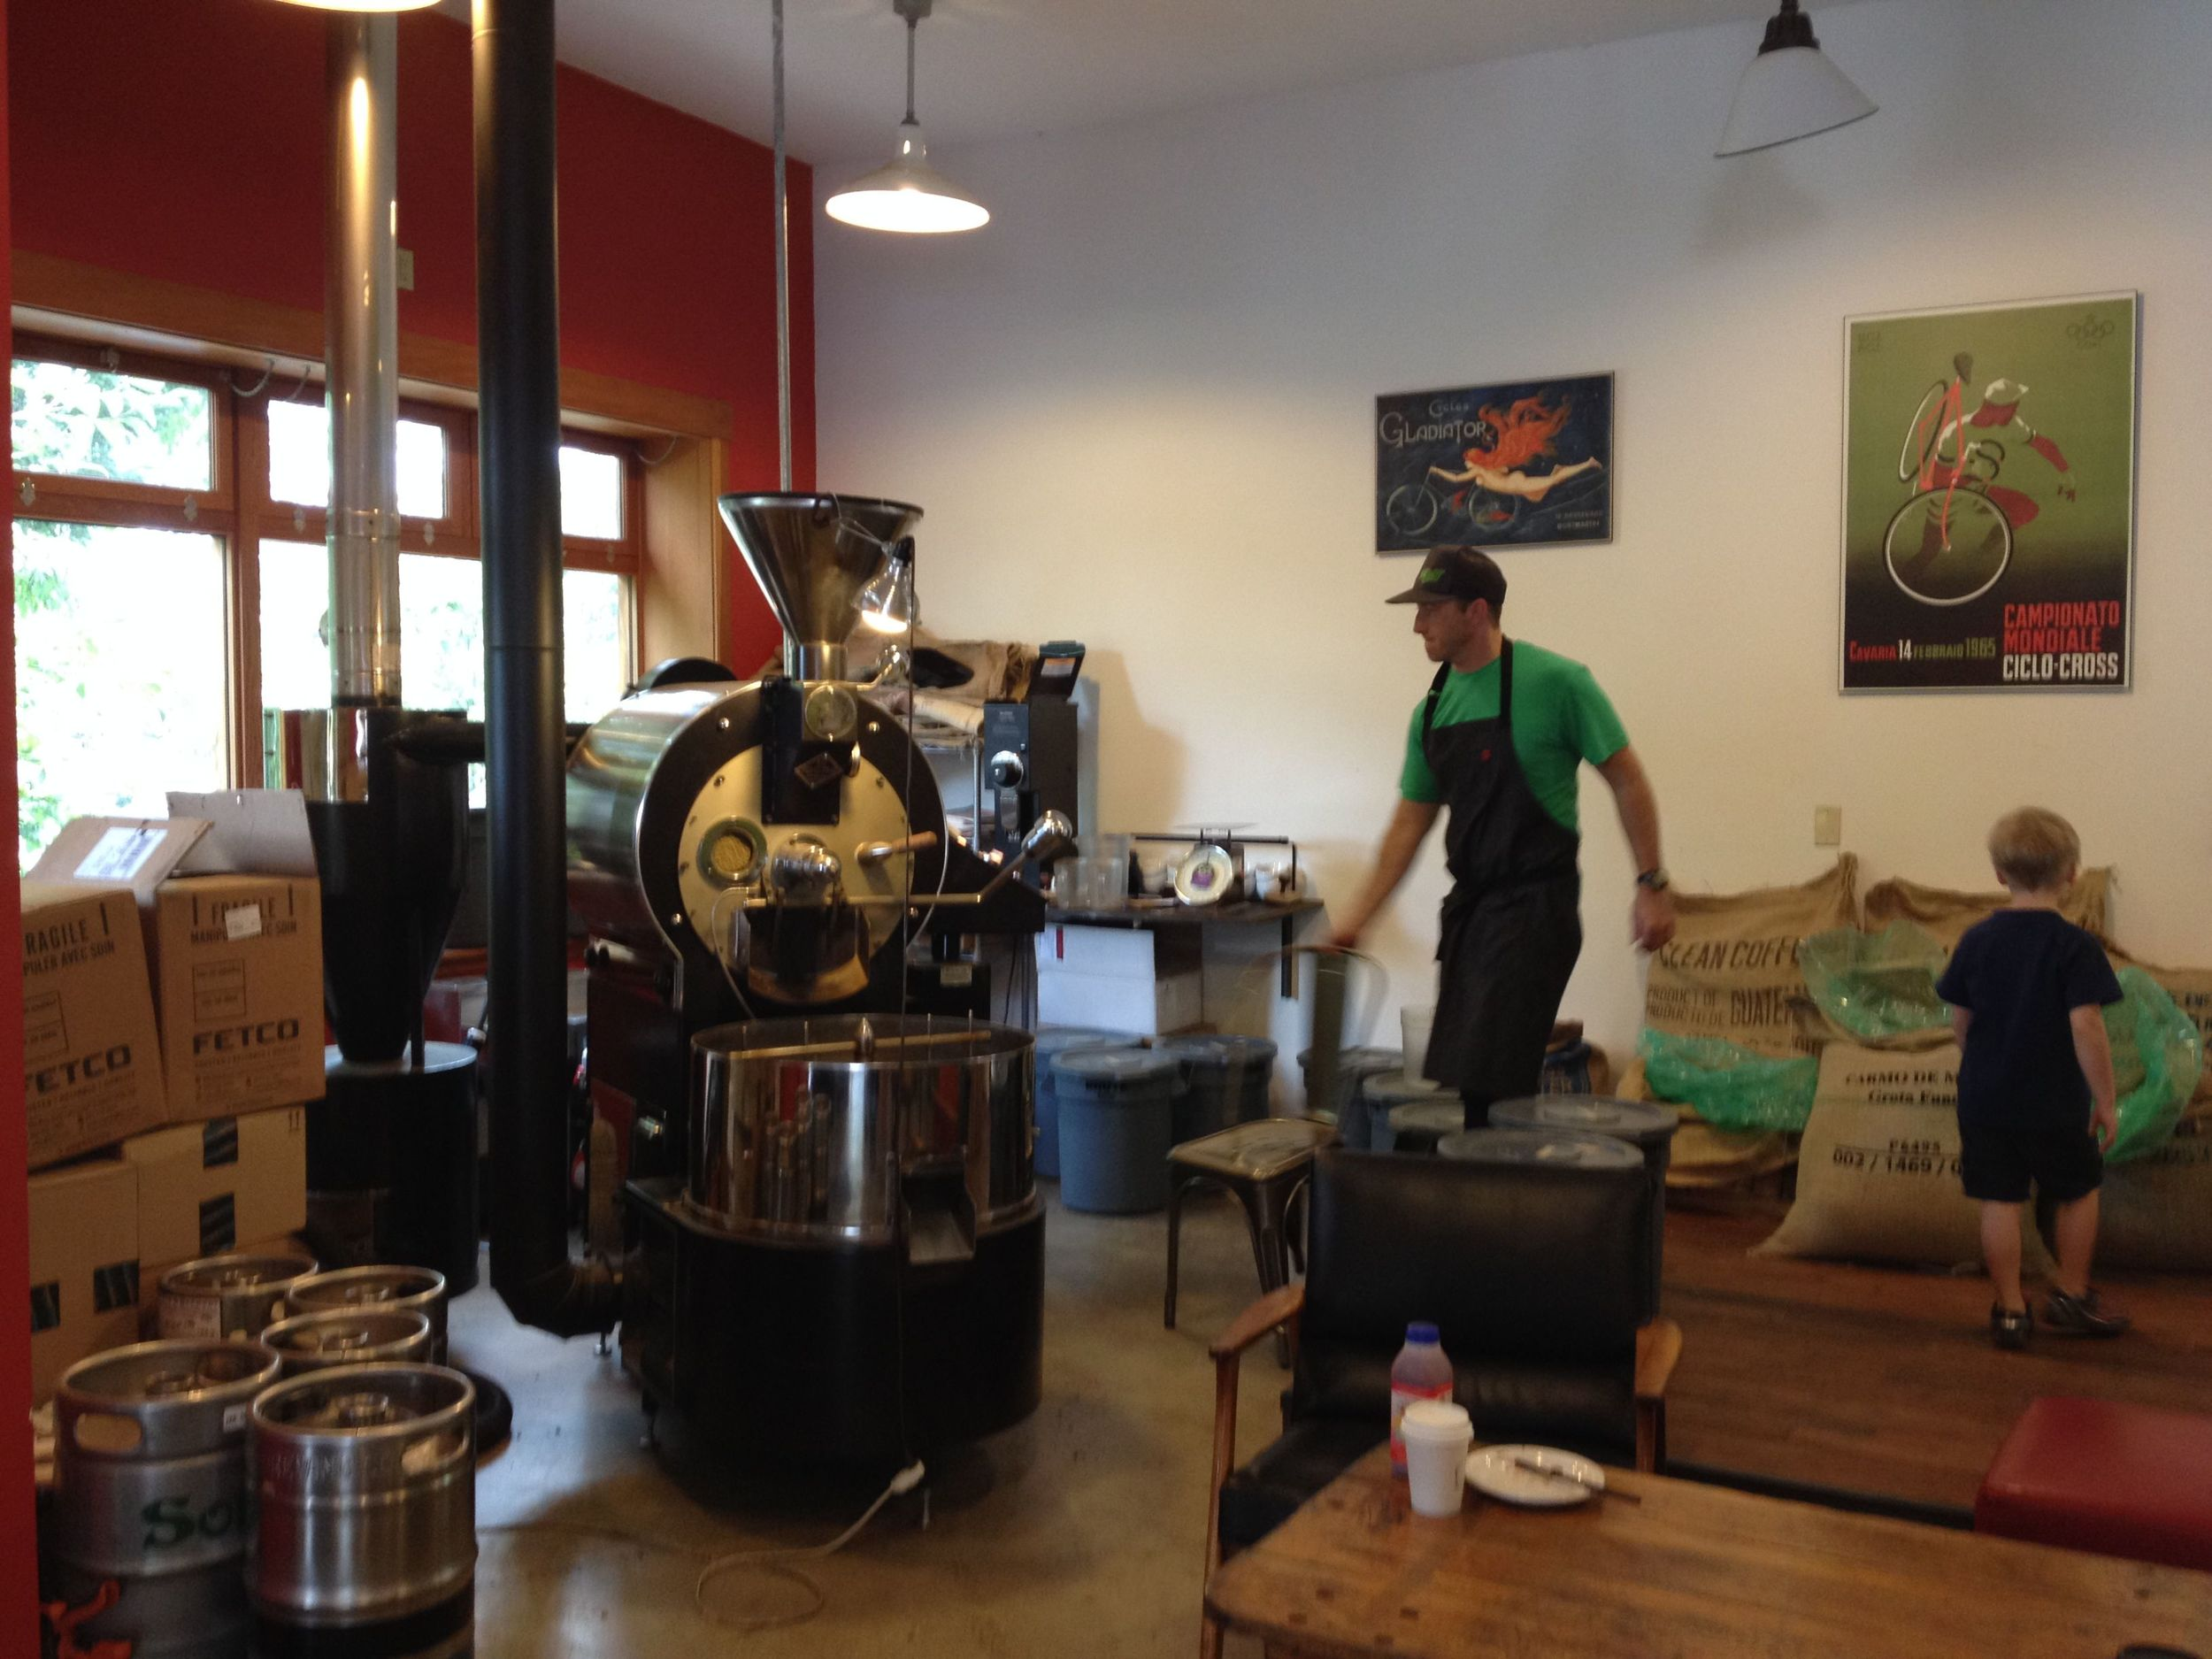 10 Speed Coffee Roasters in Mount Hood, Washington.